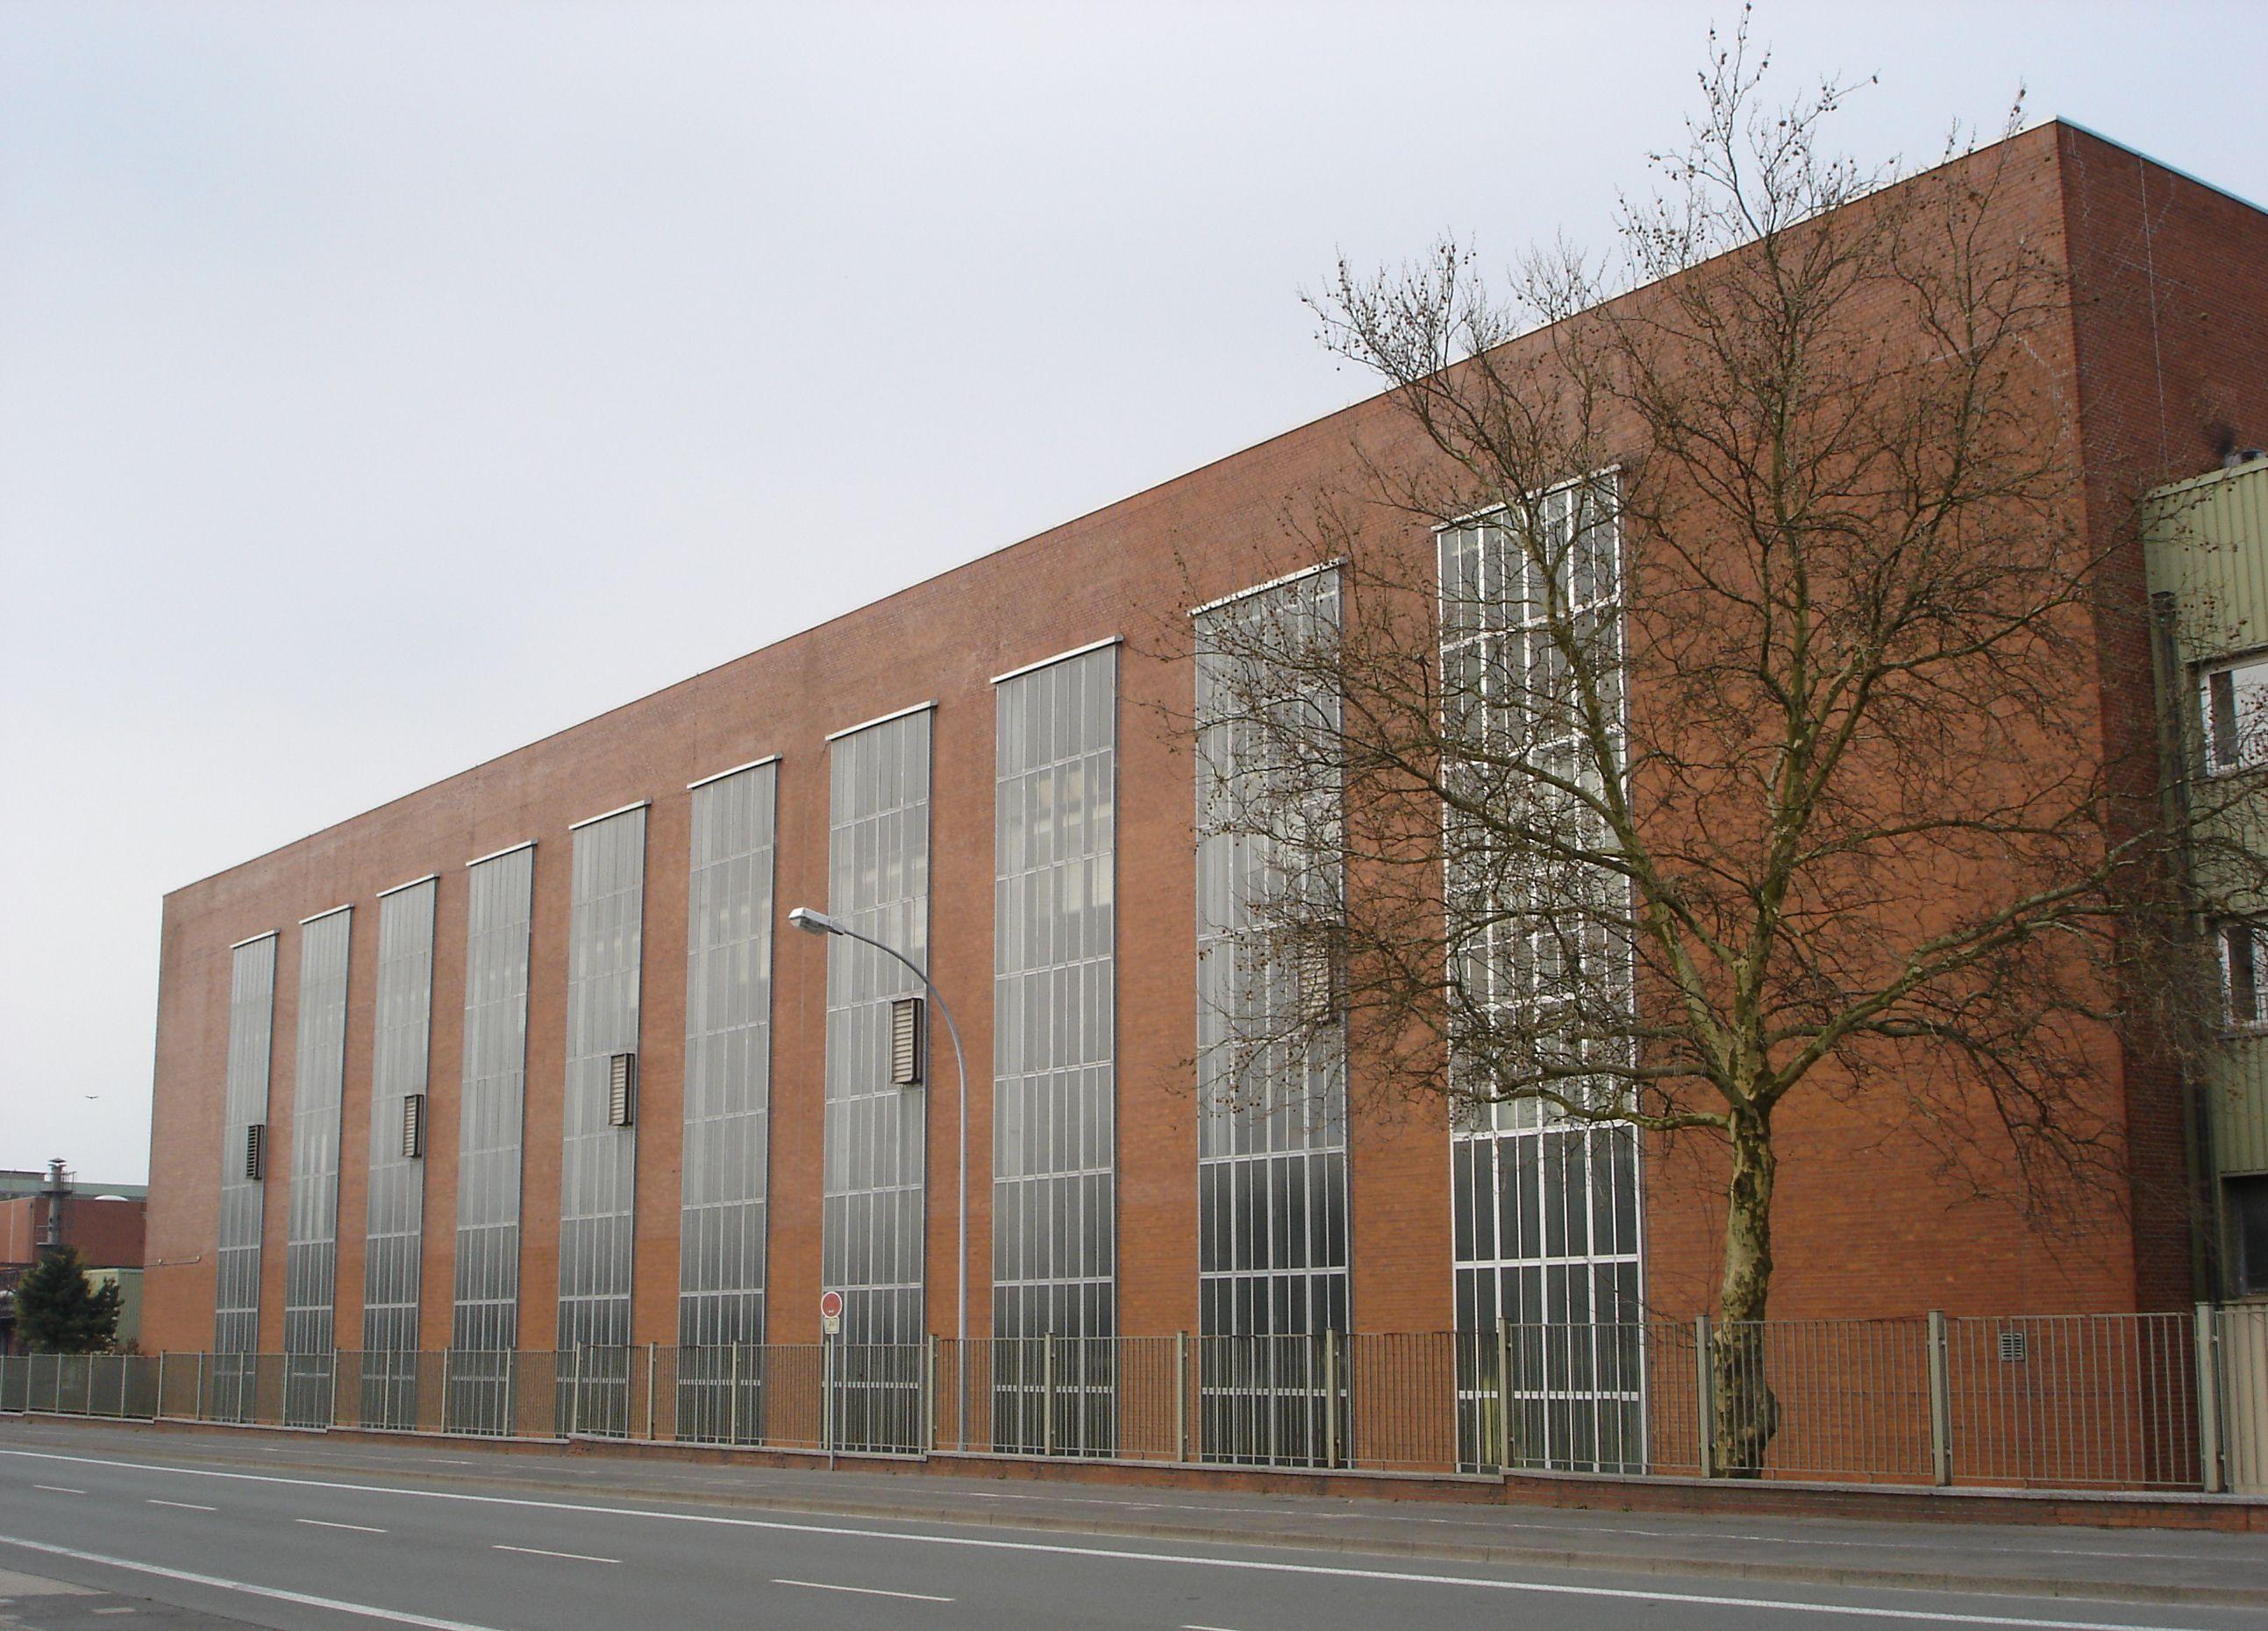 Preussag Ballastkraftwerk Ibbenbüren